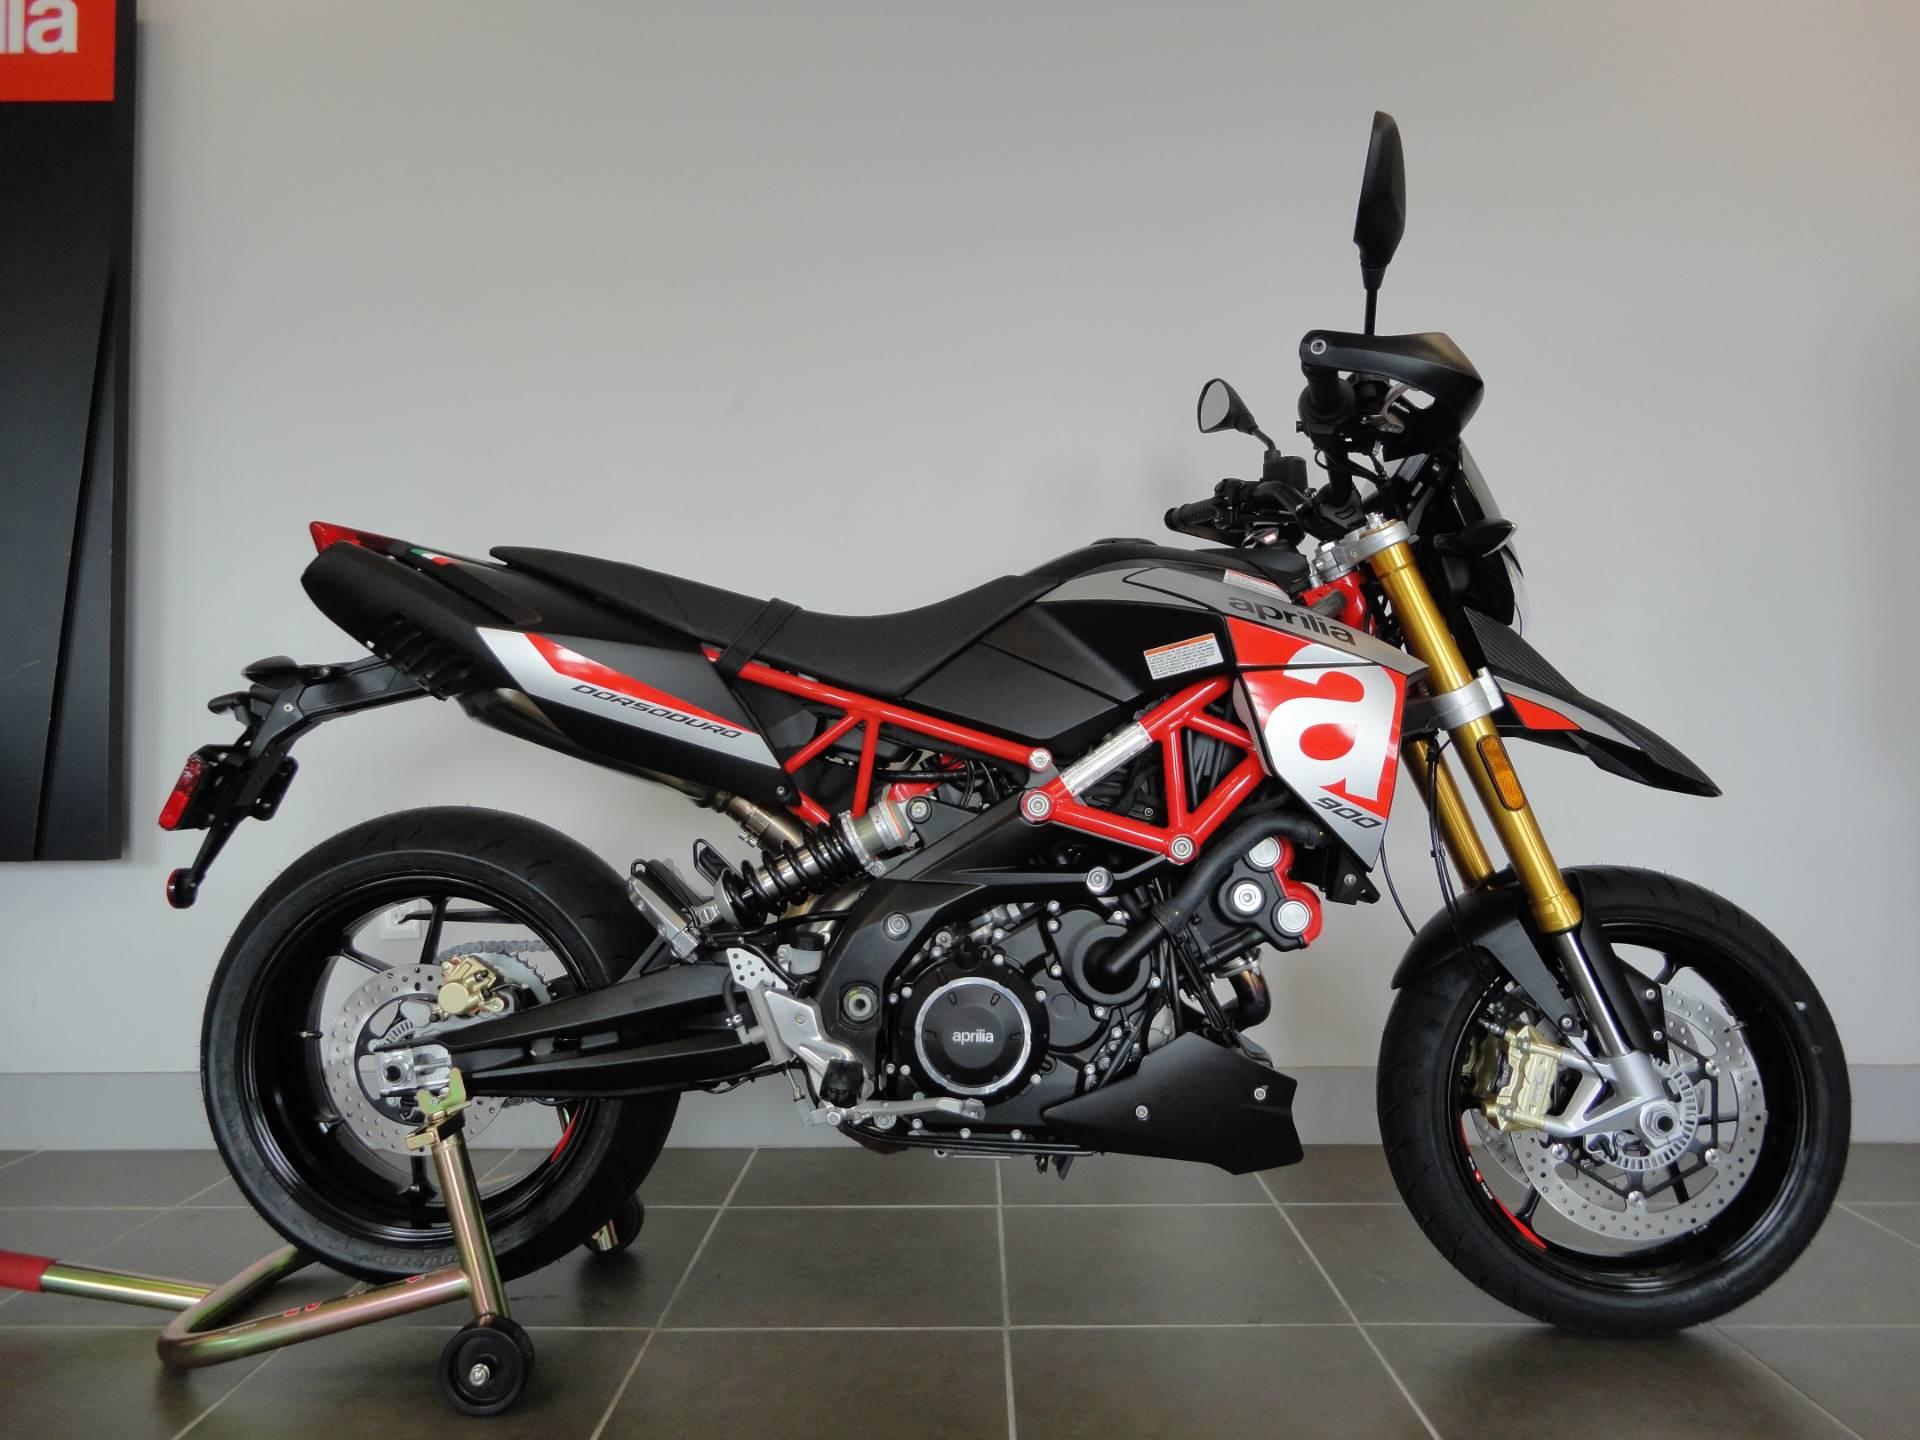 new 2018 aprilia dorsoduro 900 motorcycles in houston tx. Black Bedroom Furniture Sets. Home Design Ideas